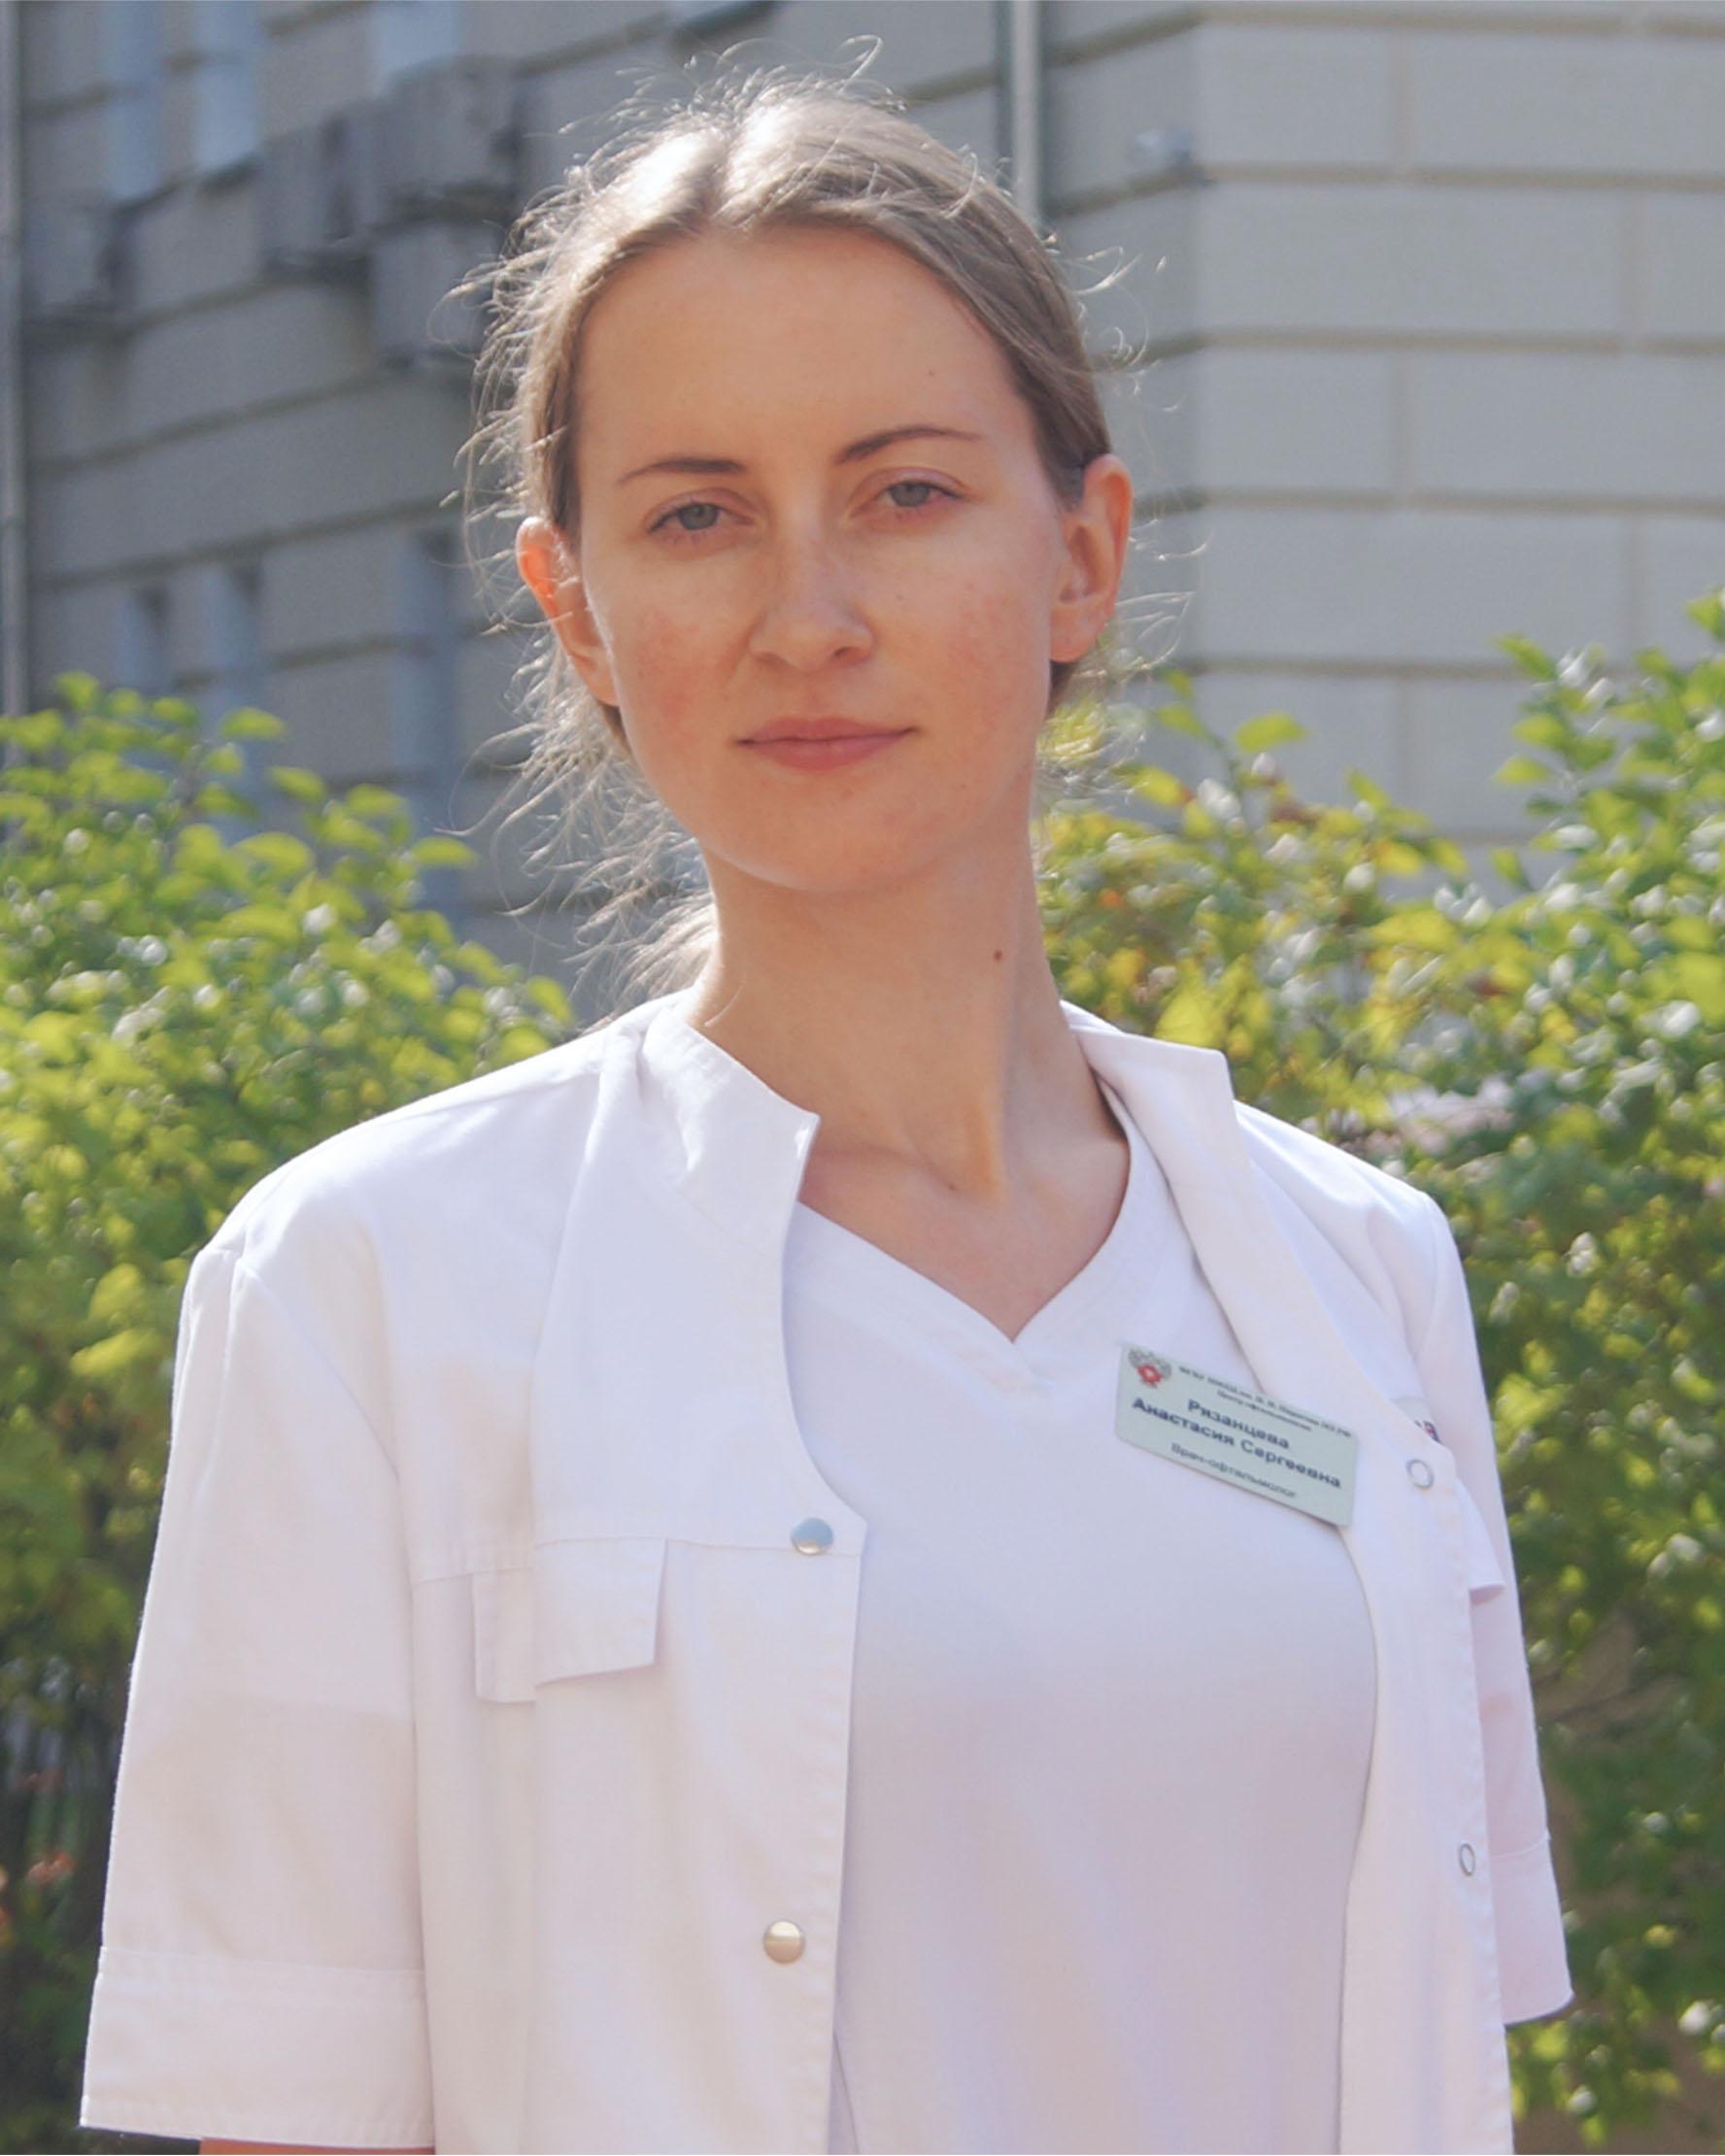 Рязанцева Анастасия Сергеевна